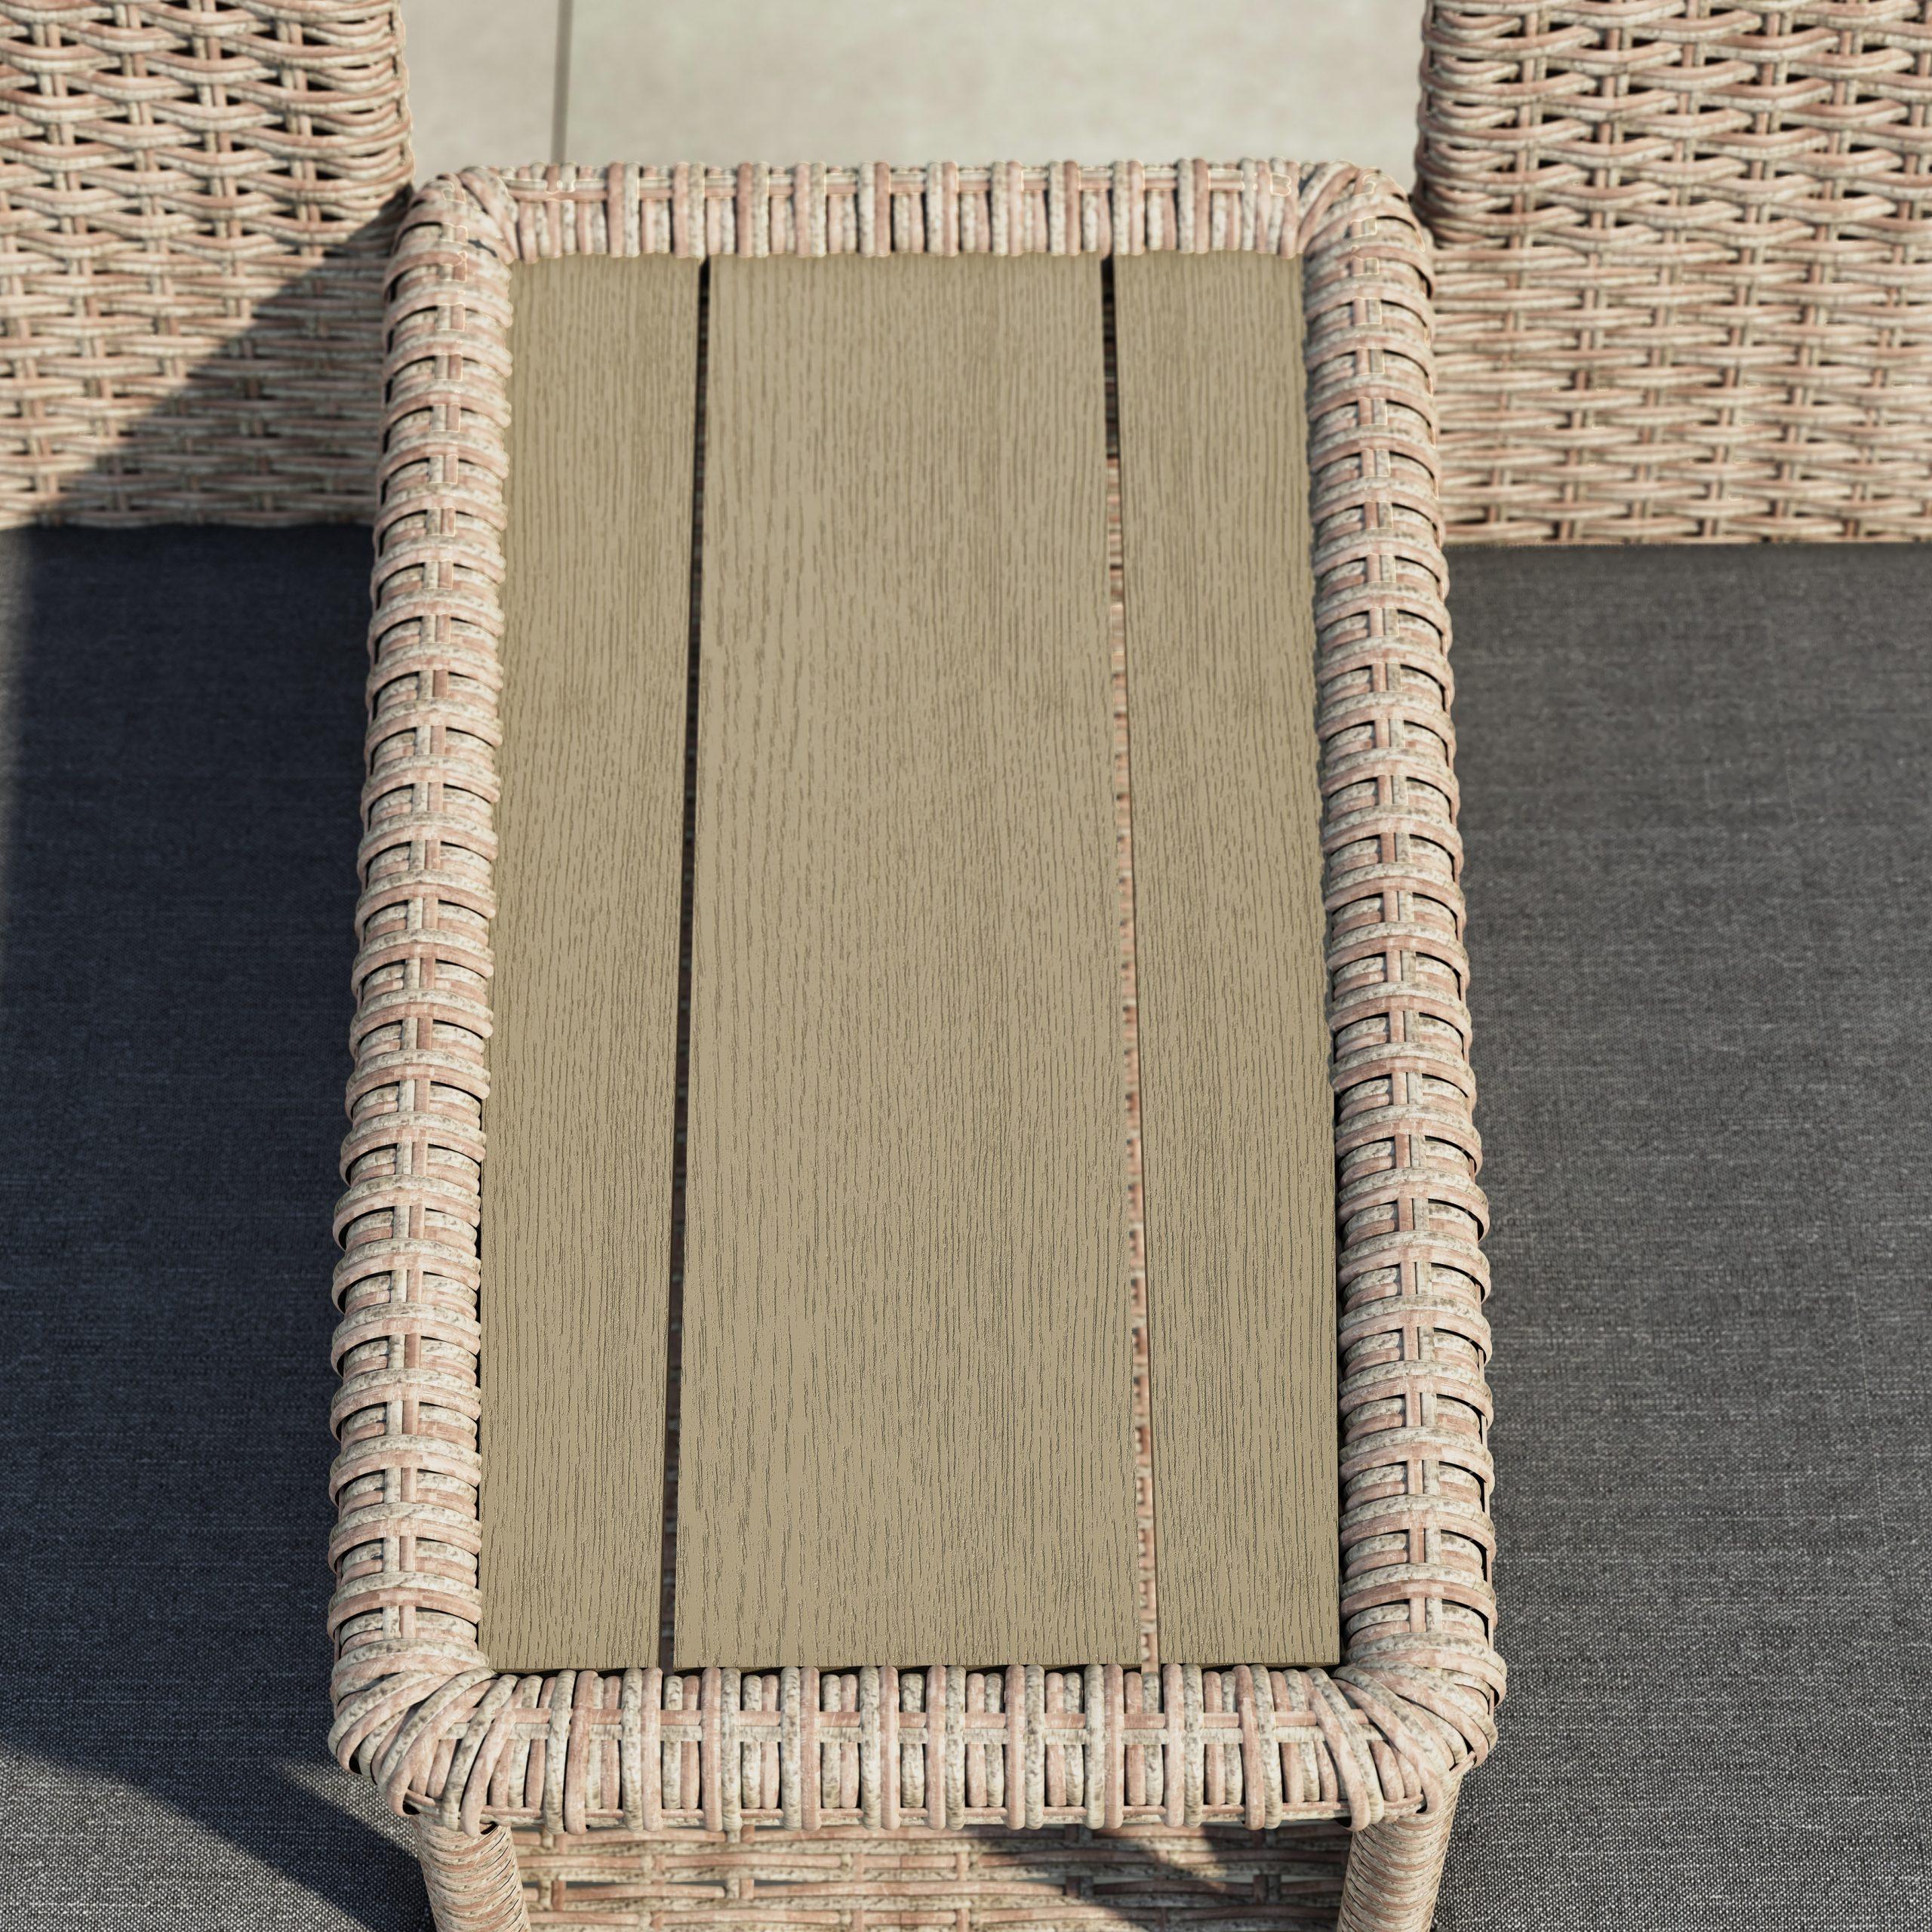 Fashionable Corvus Armitage Outdoor Wicker Tete A Tete Bench Throughout Wicker Tete A Tete Benches (View 13 of 30)